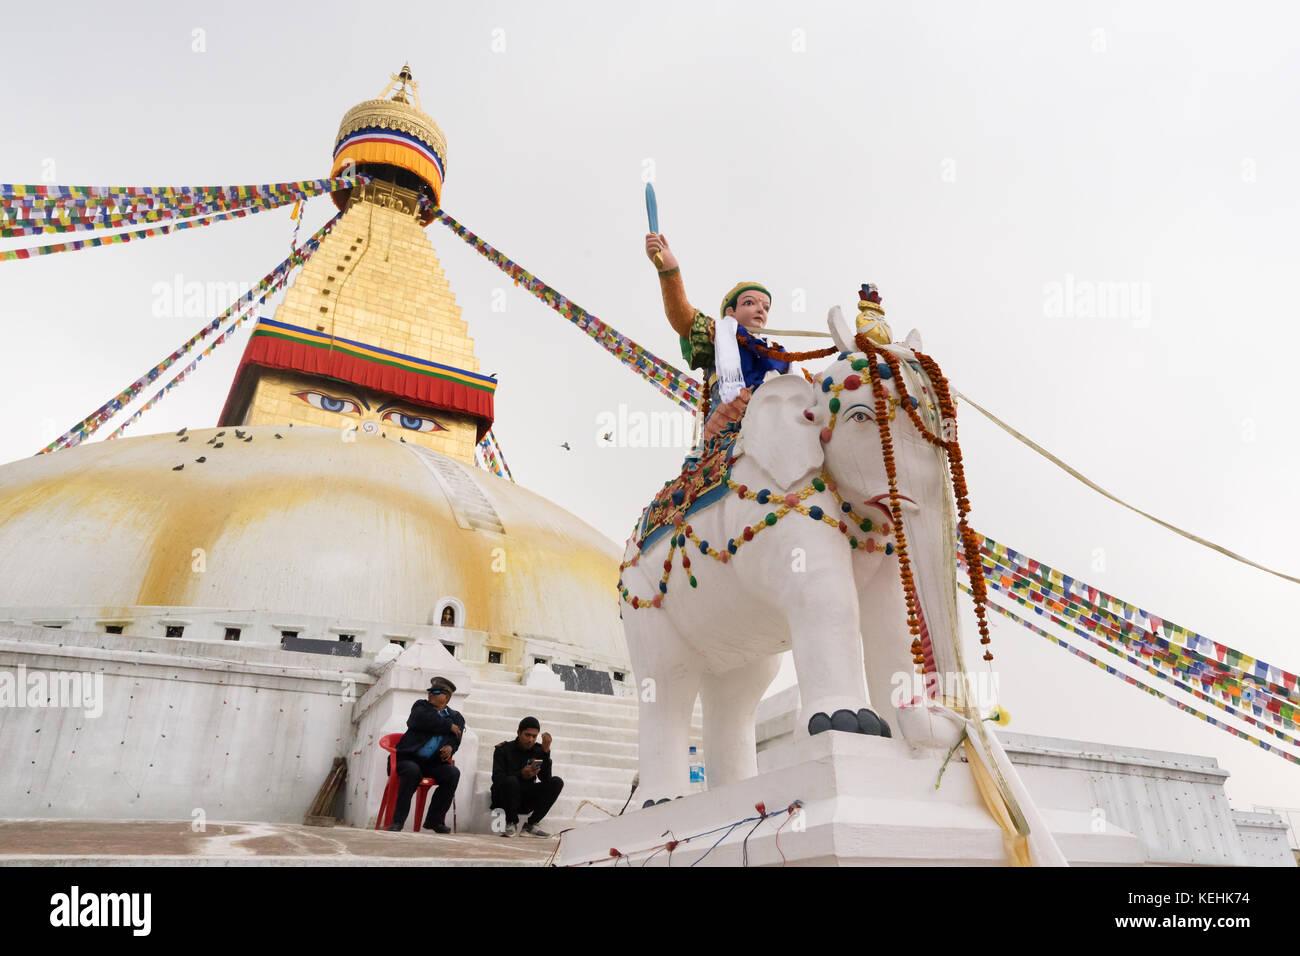 Ornated elephant statue and guards at Bodnath Stupa, Kathmandu, Nepal. - Stock Image